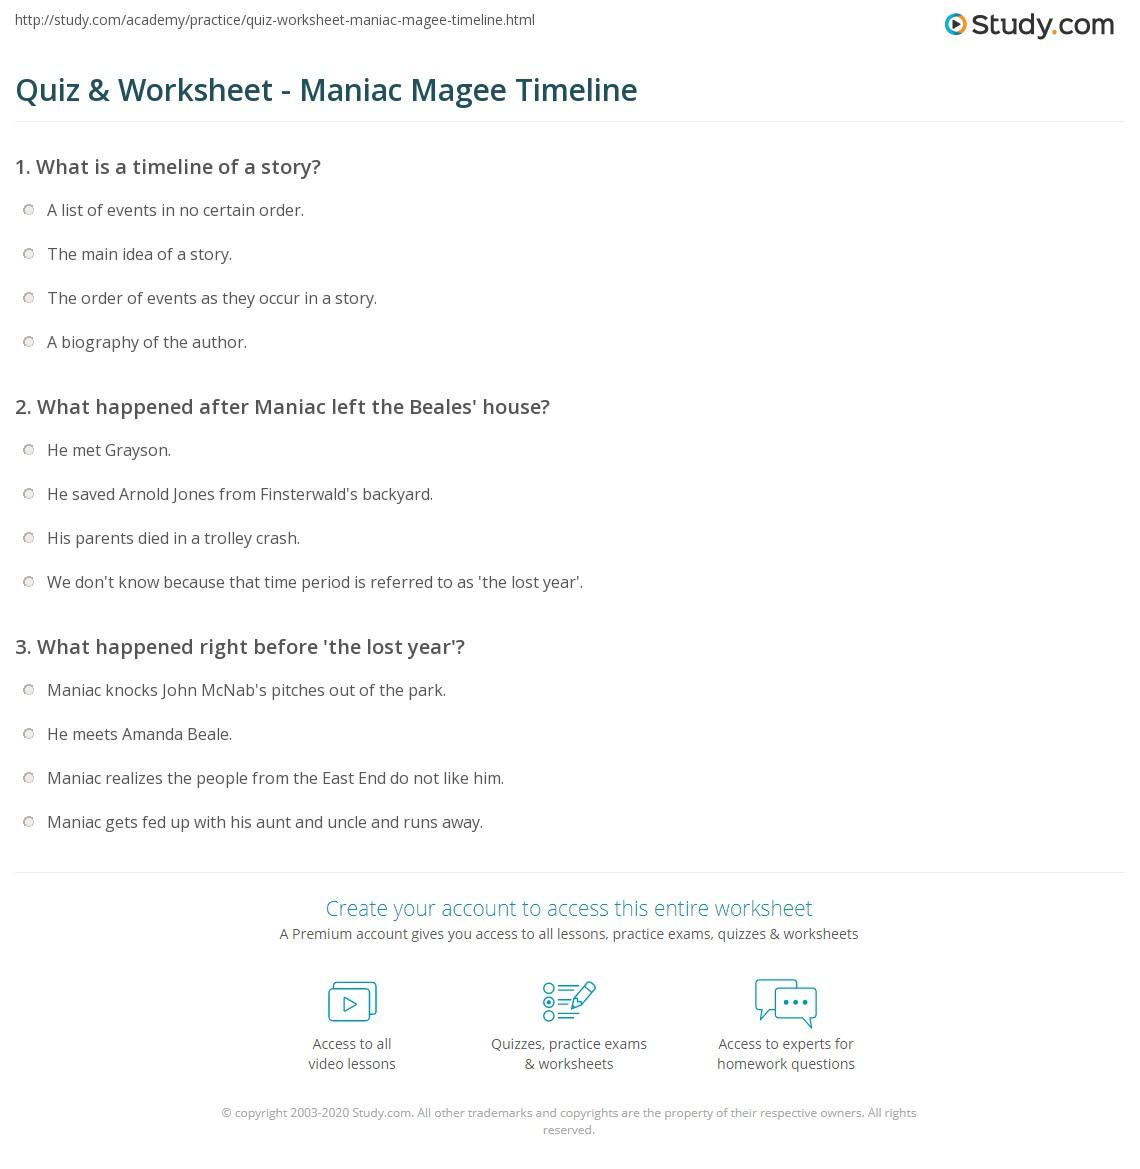 Quiz & Worksheet - Maniac Magee Timeline | Study.com